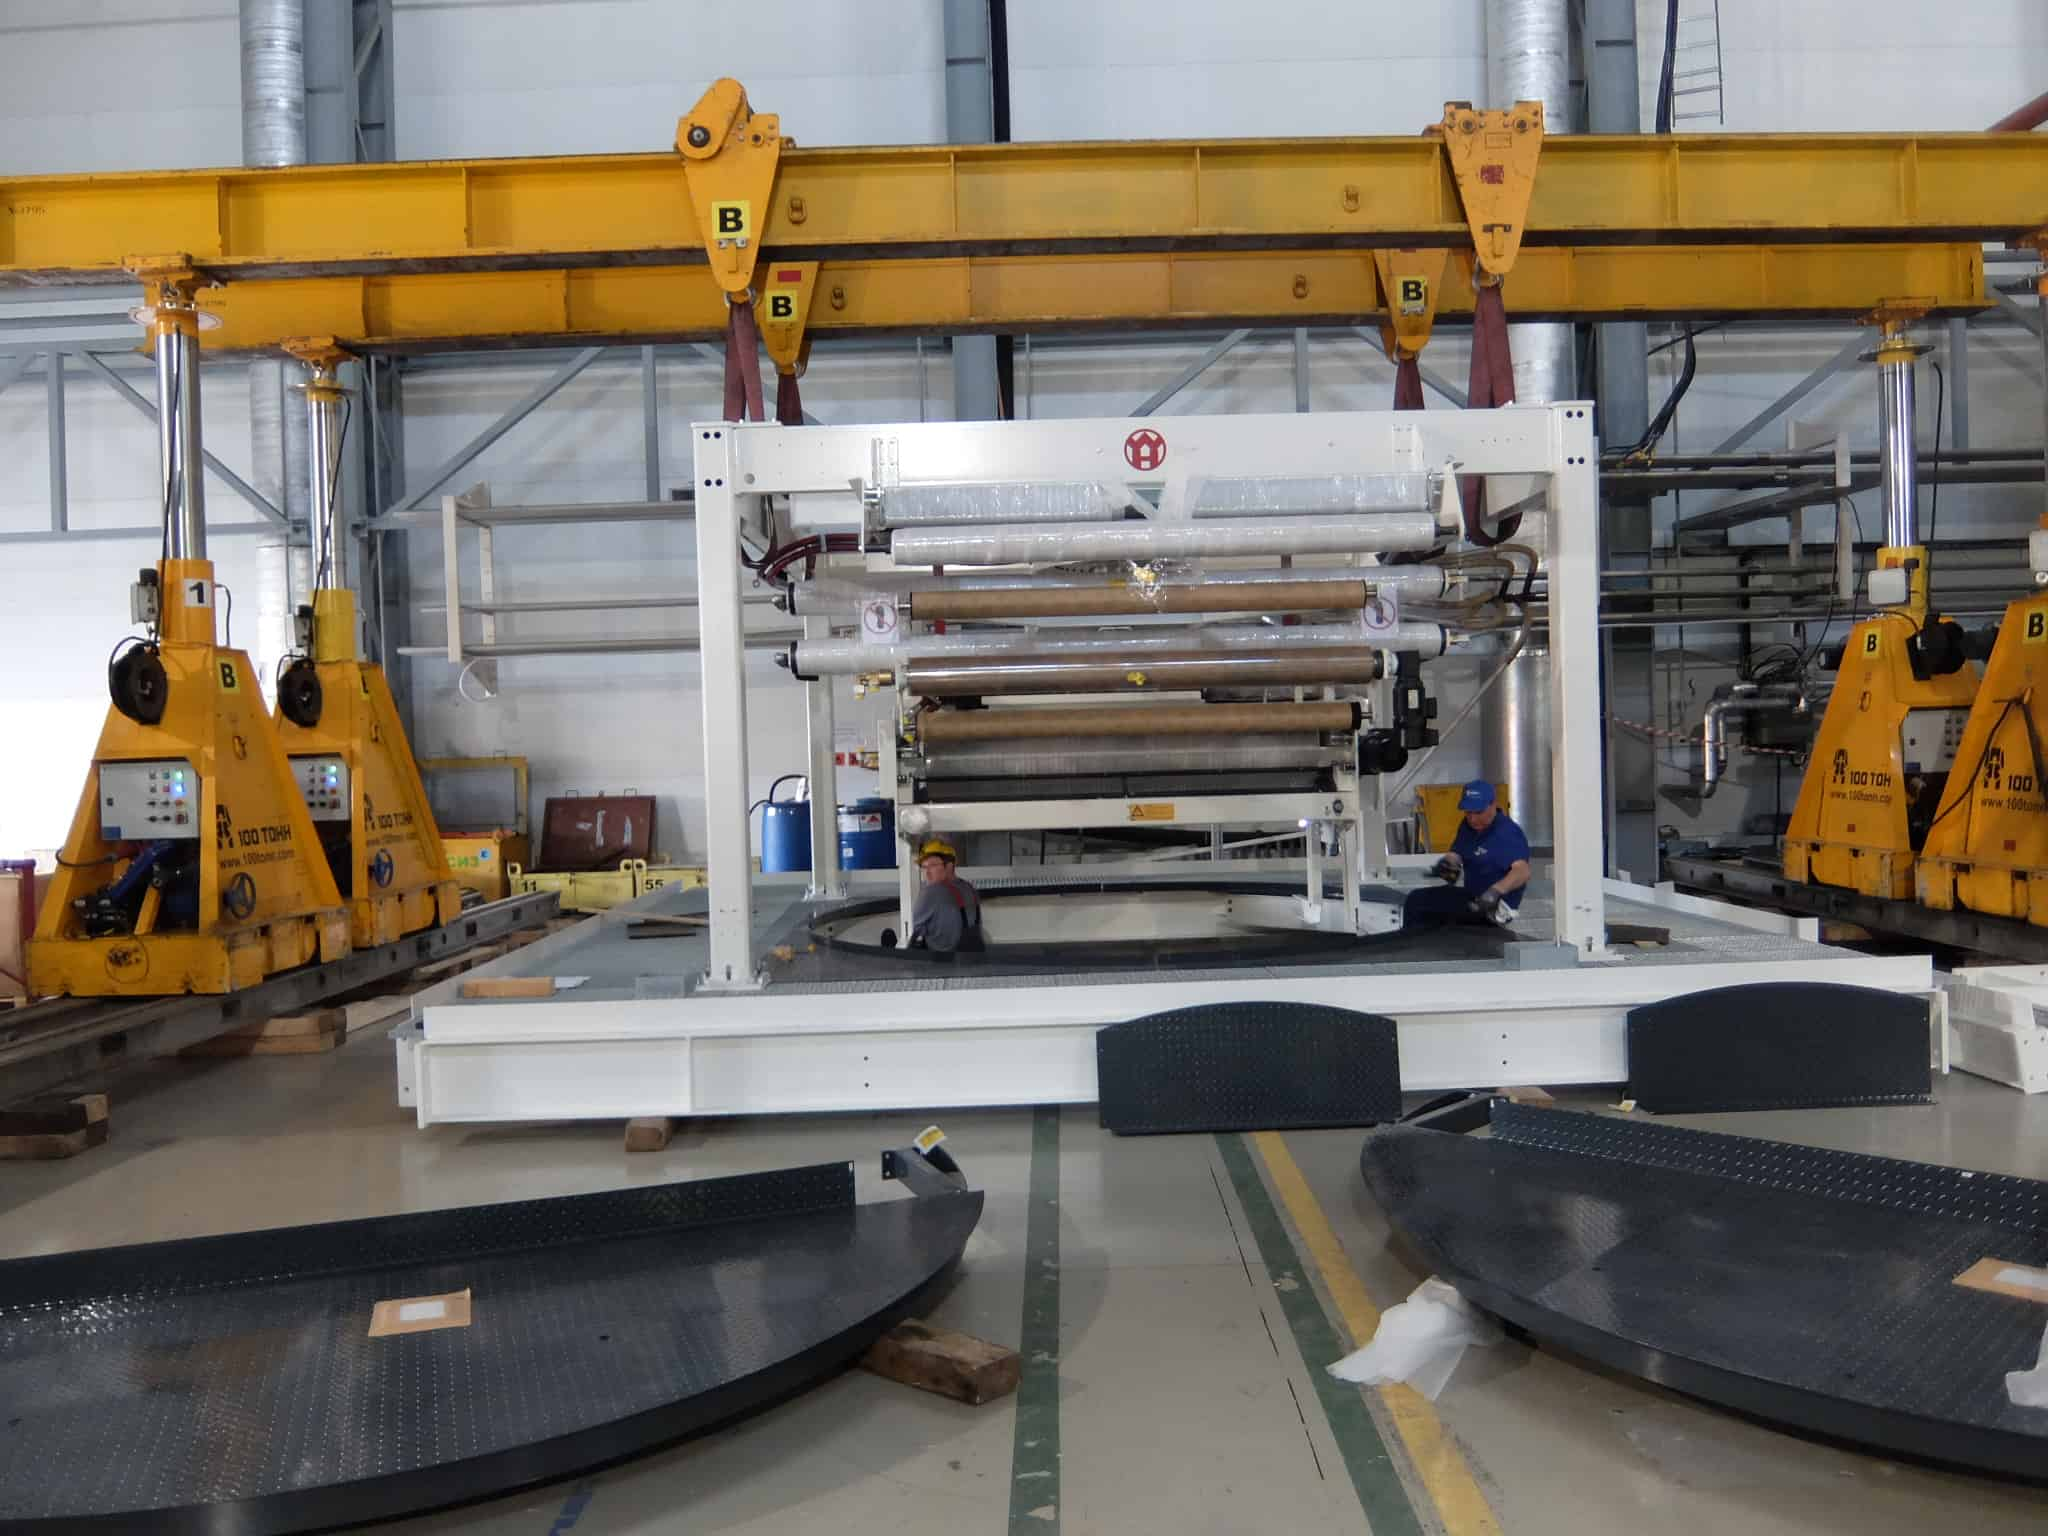 Сборка экструдера на верхней̆ секции на заводе Монди-Уралпластик